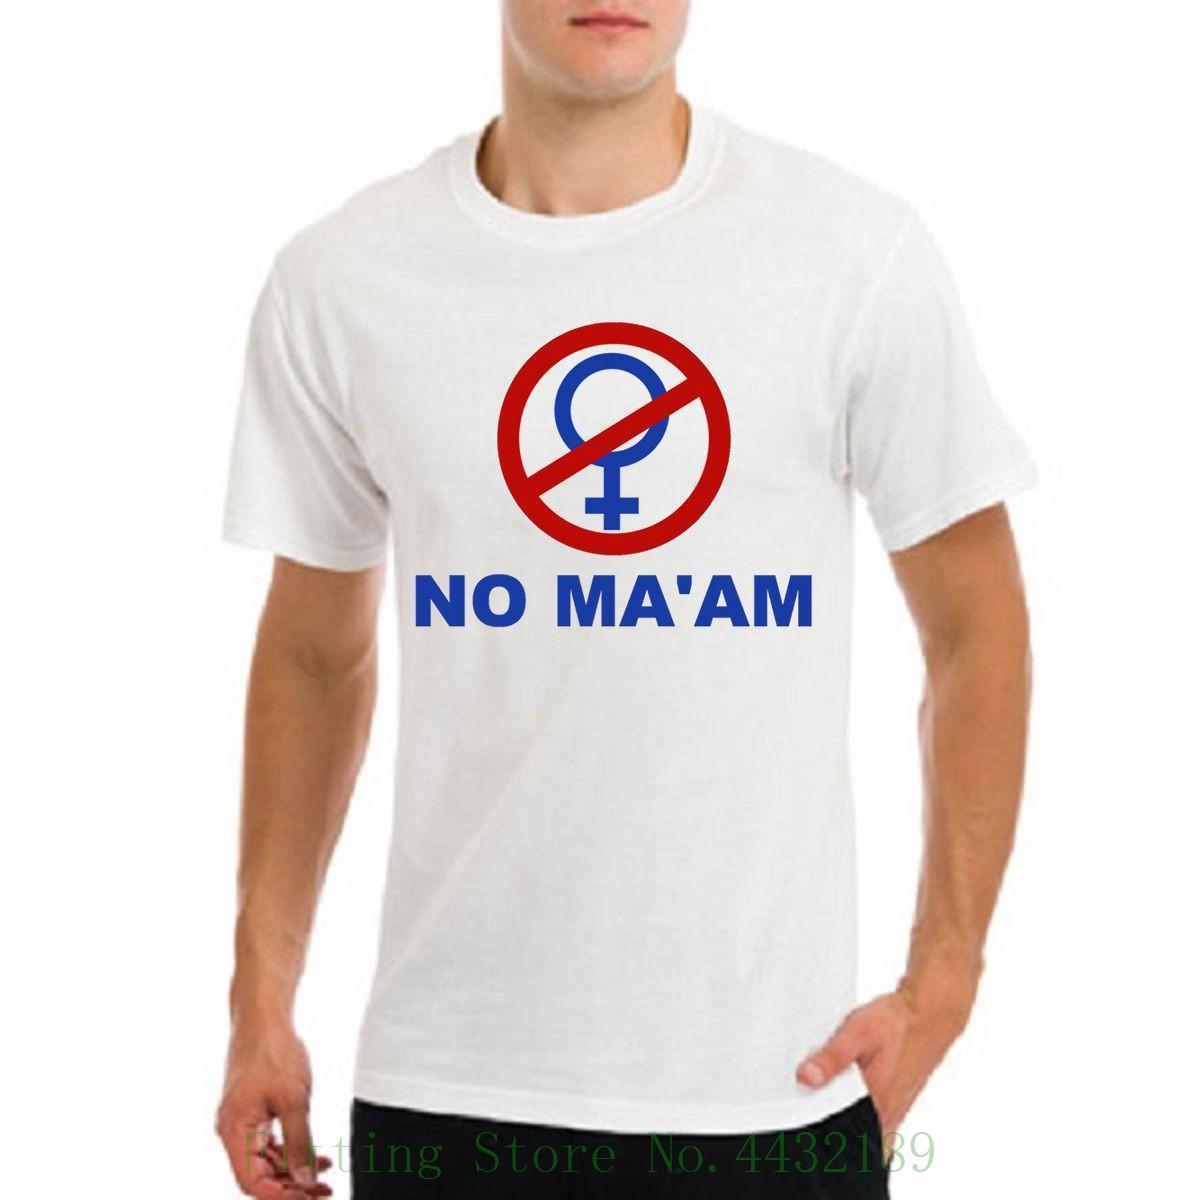 bce84068b Married With Children Al Bundy No Maam Ma'am Logo Funny White T Shirt  Harajuku Cool Tshirt Homme